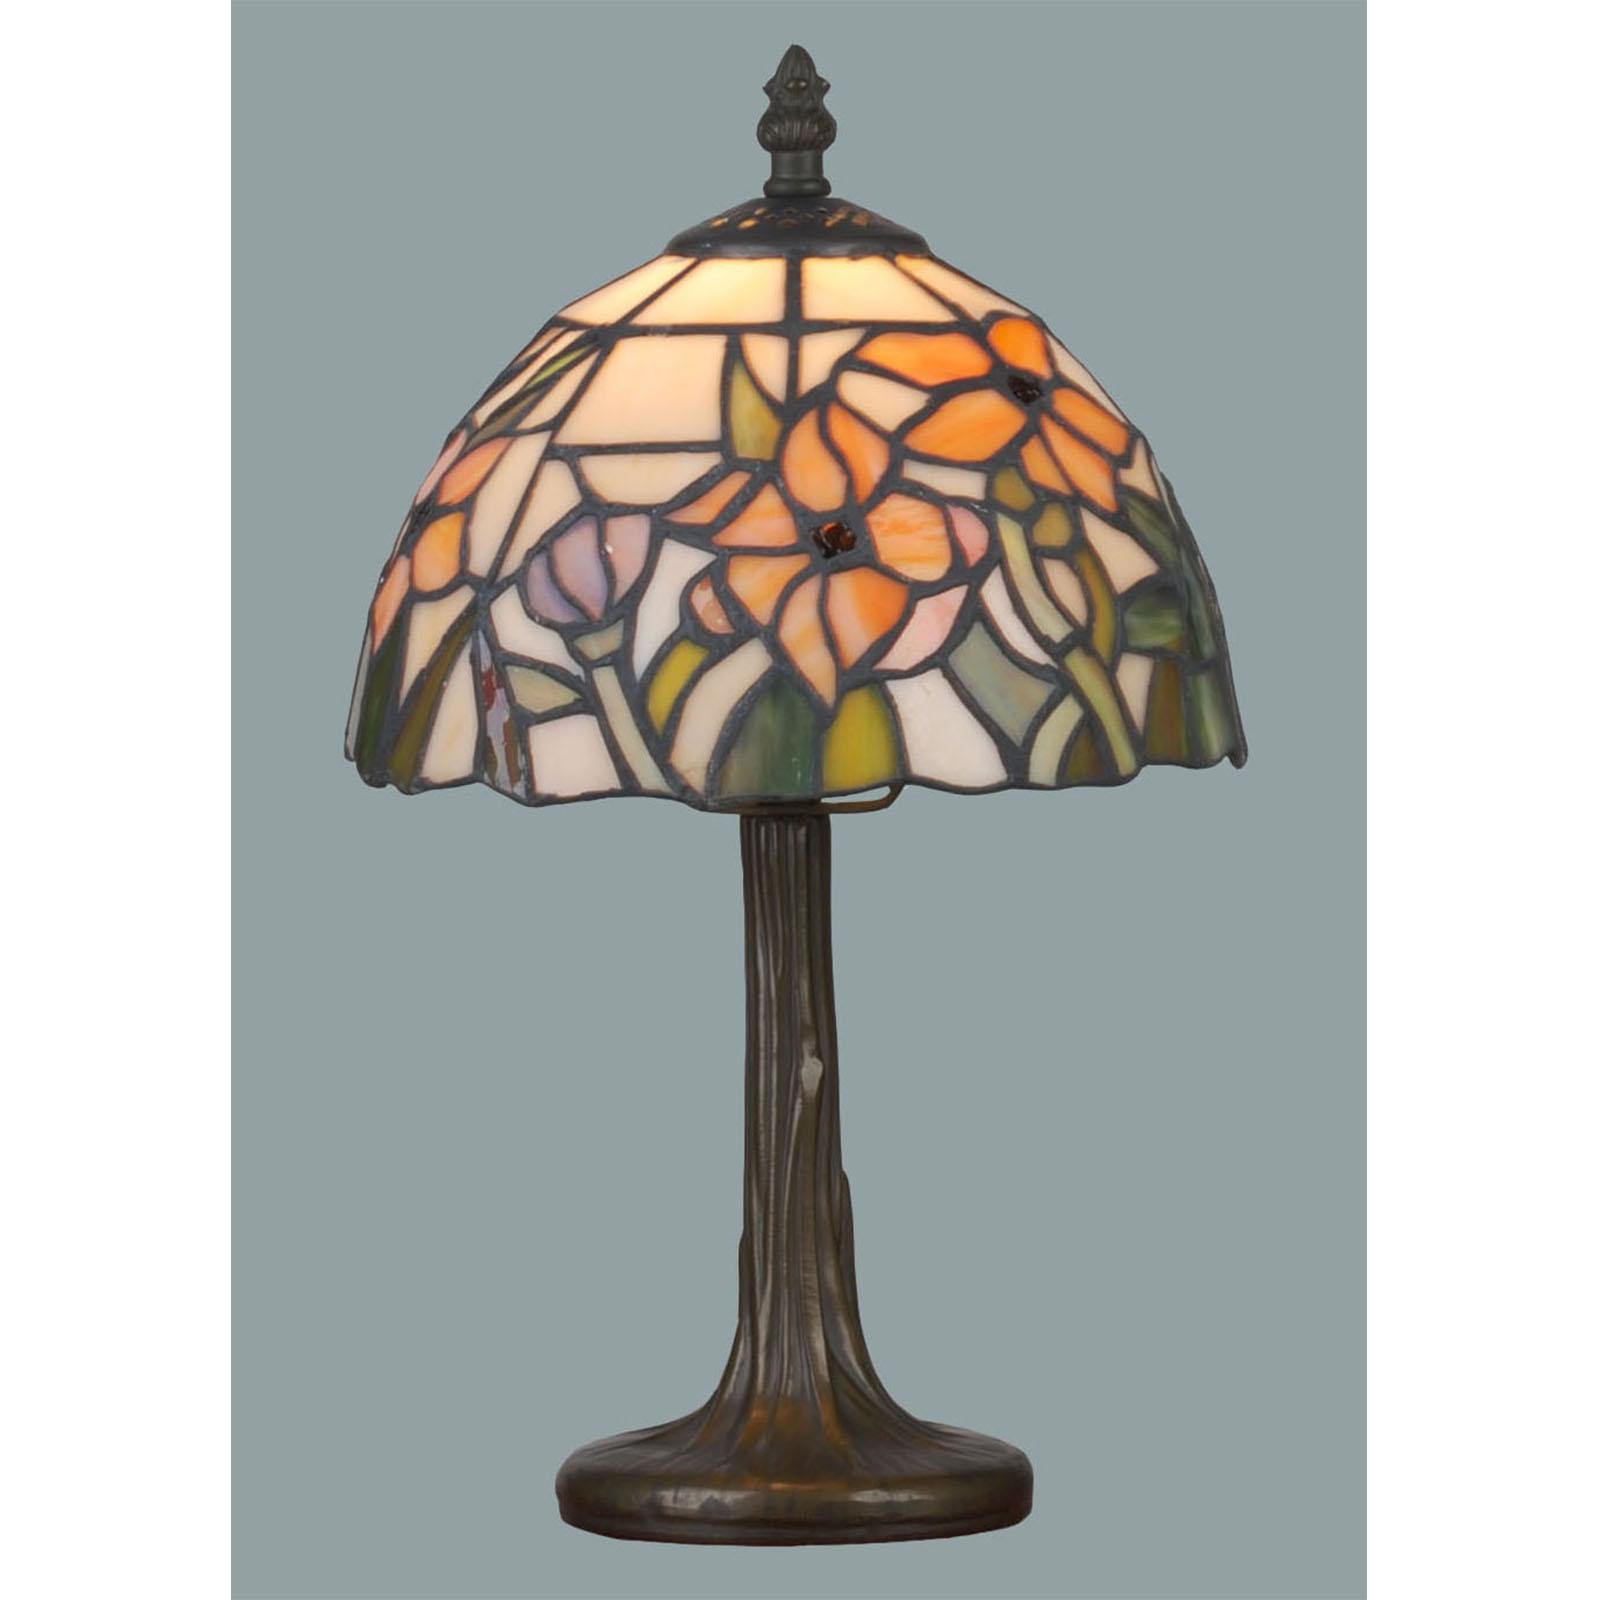 kleine tiffany lampe lilie mit blumen in orange gr n. Black Bedroom Furniture Sets. Home Design Ideas